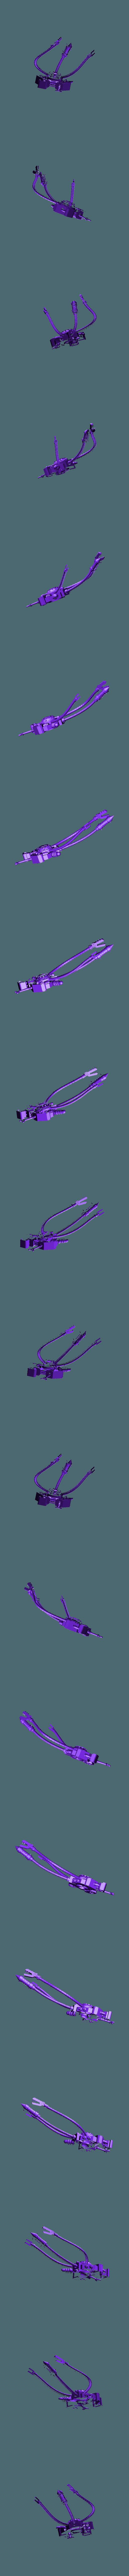 Ranger_3.1_-_Backpack.stl Download free STL file Martian Mechanized Rangers • 3D printable object, ErikTheHeretek